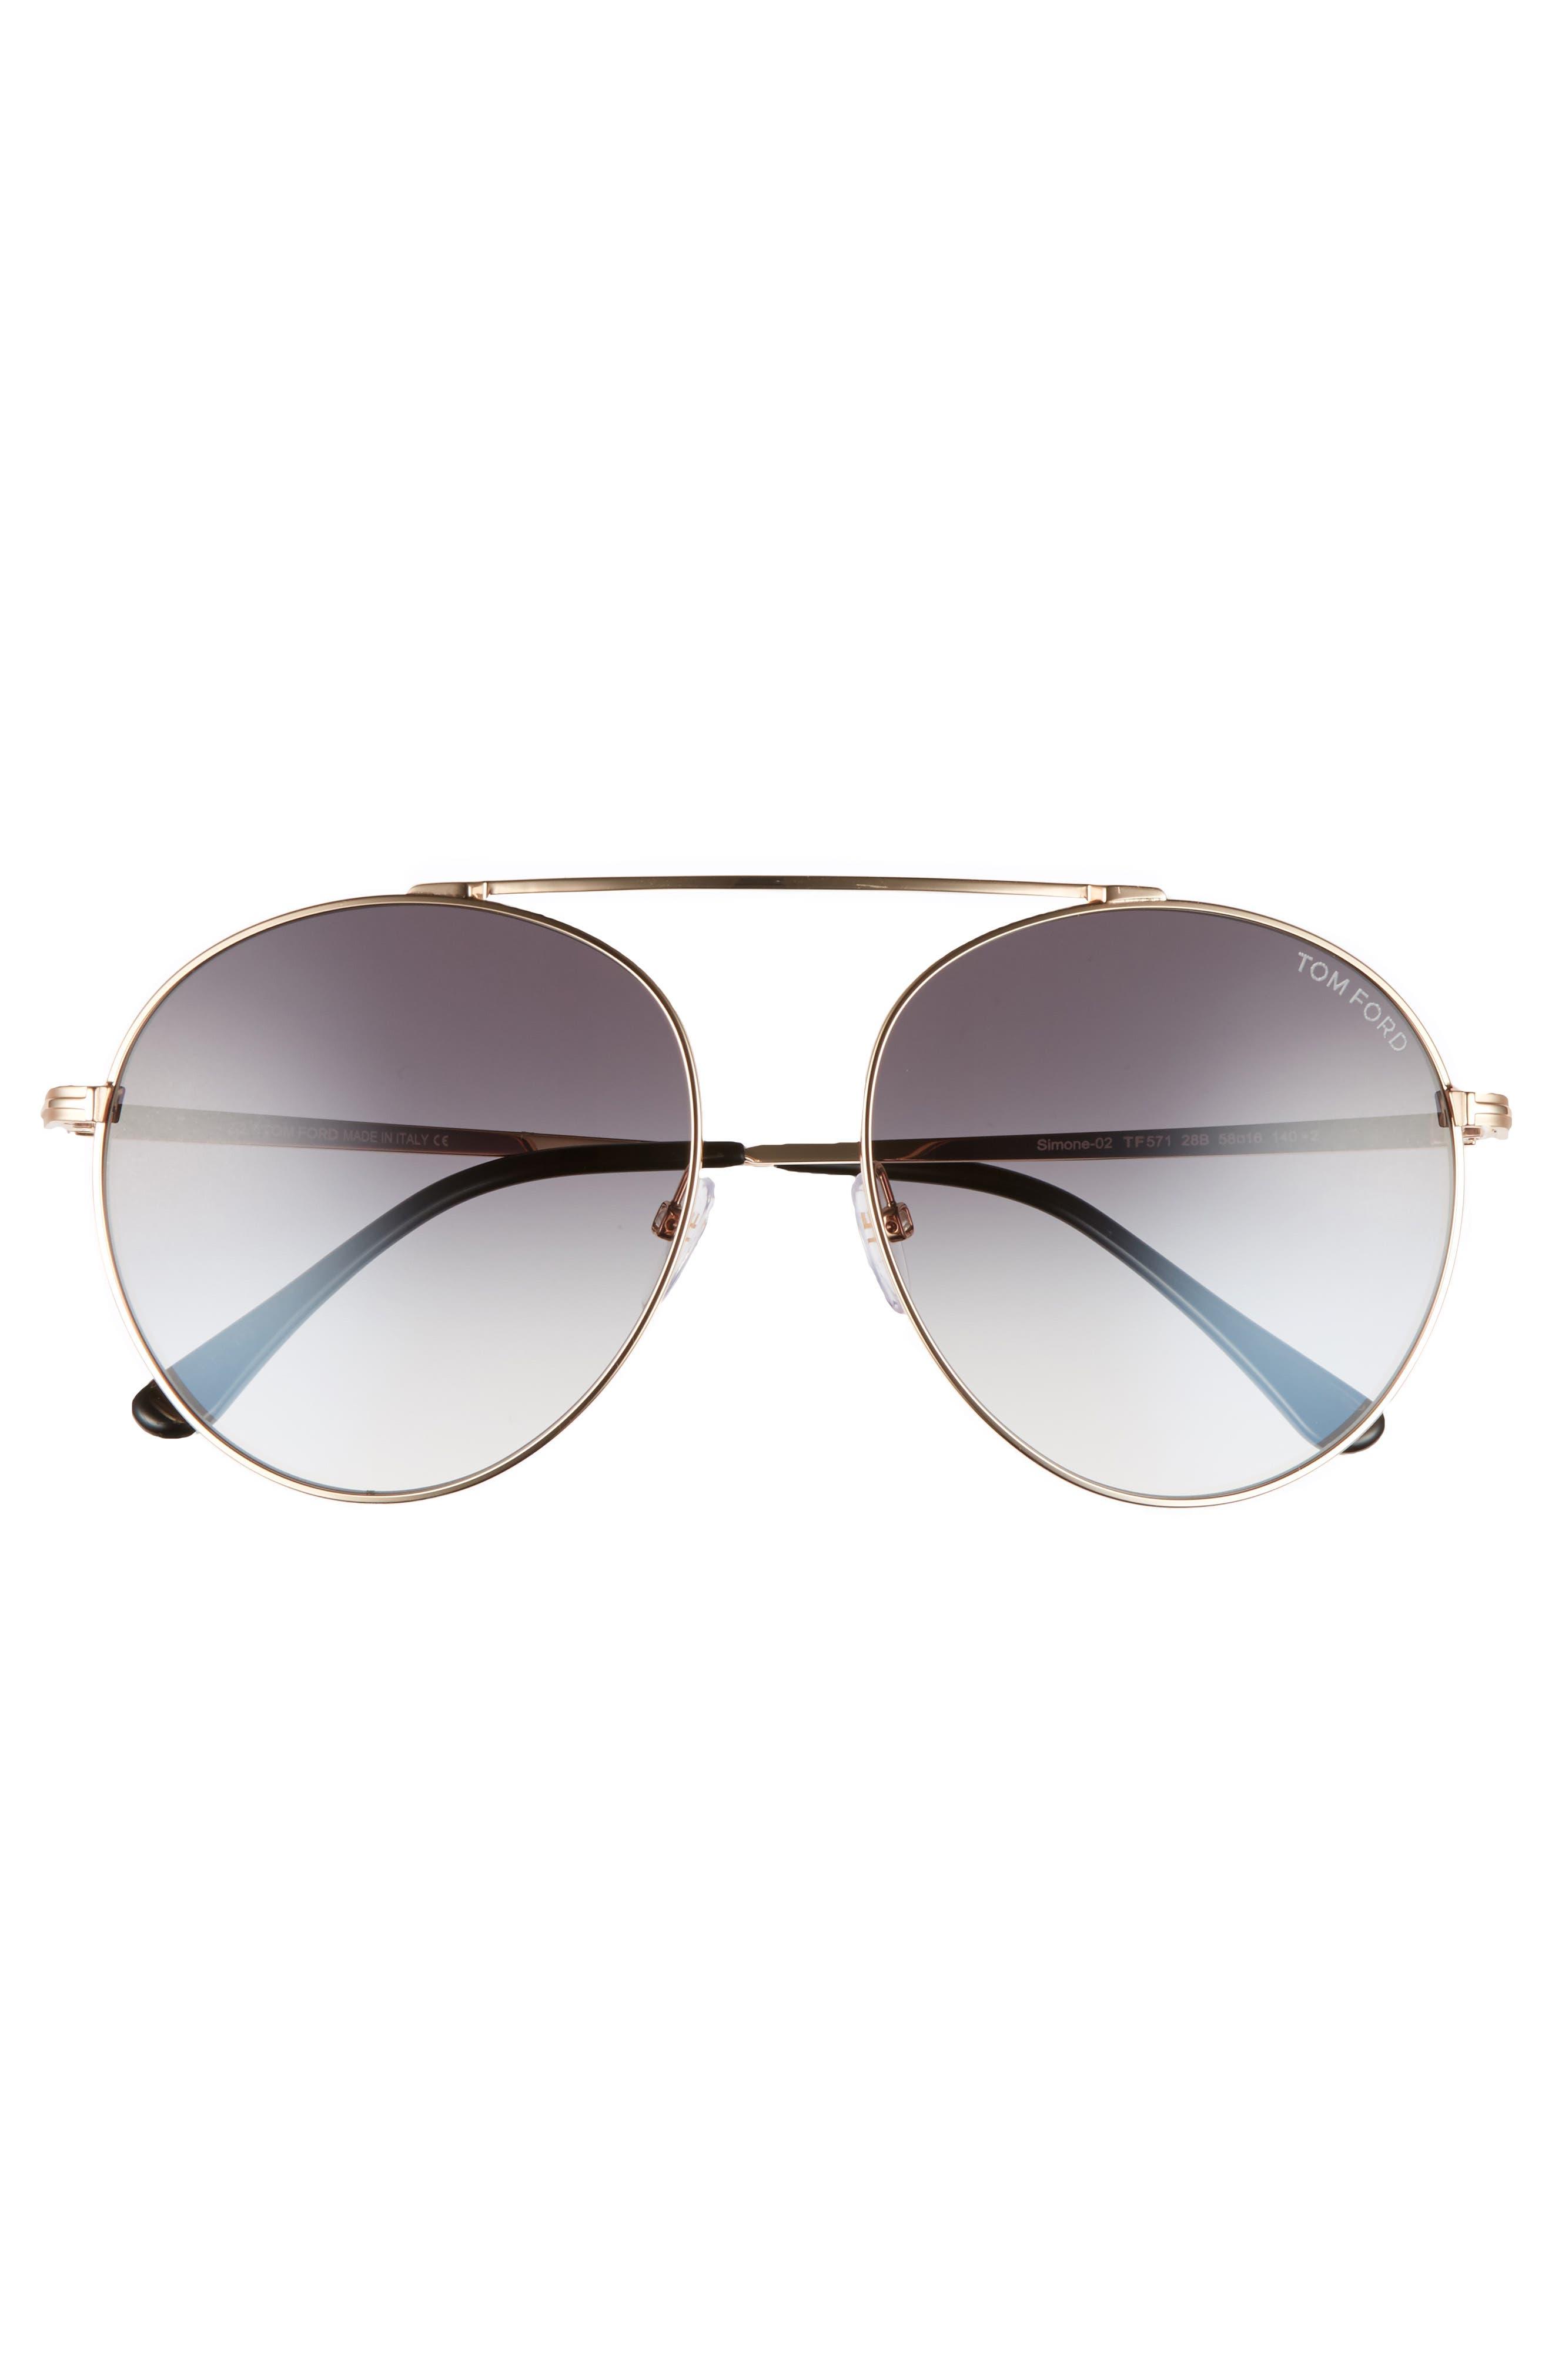 Simone 58mm Gradient Mirrored Round Sunglasses,                             Alternate thumbnail 3, color,                             710